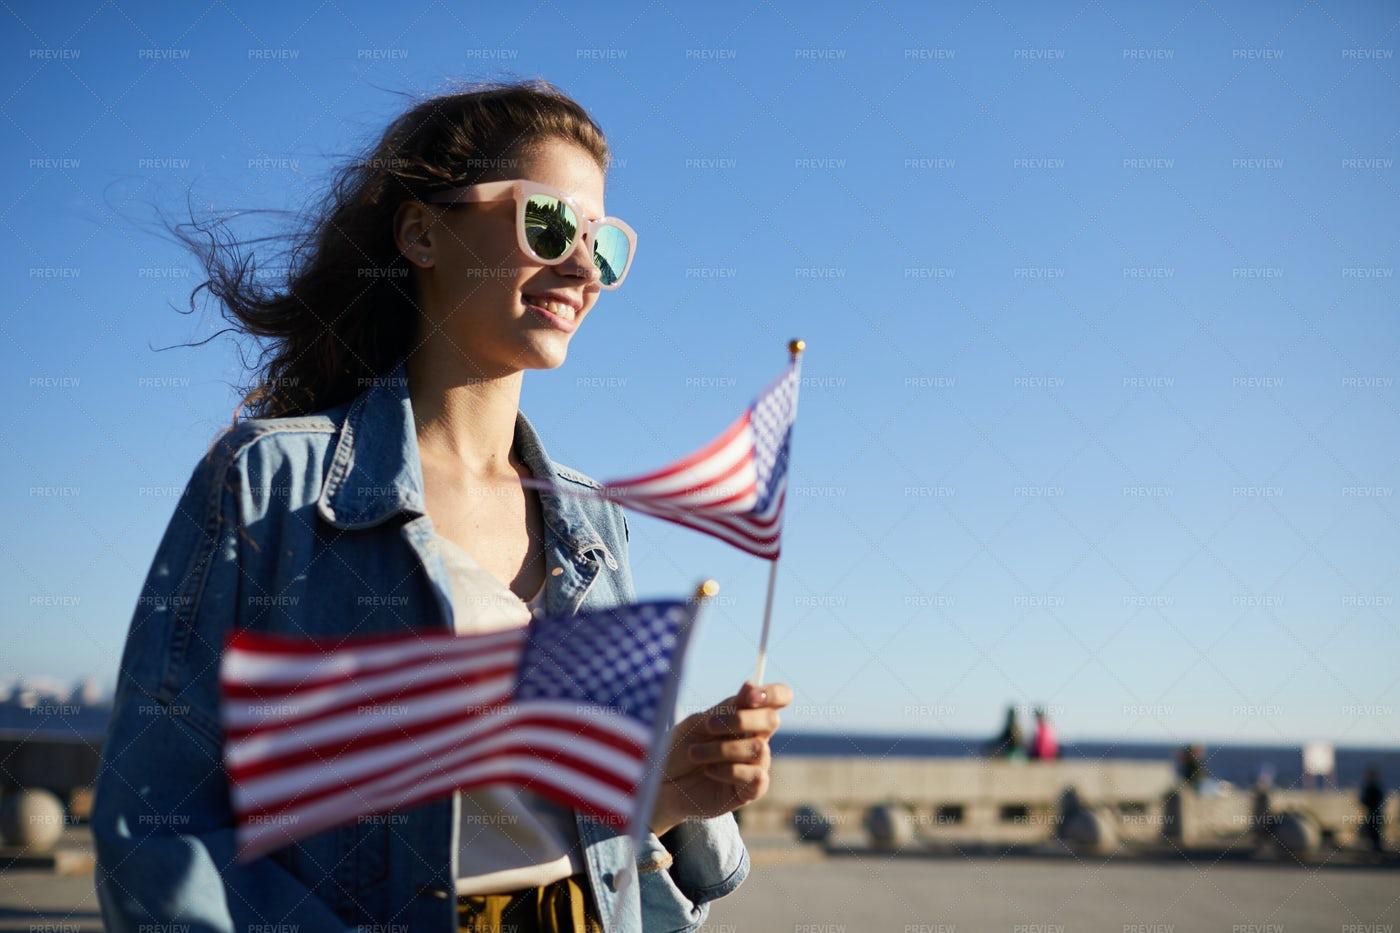 City Girl Walking At Independence...: Stock Photos